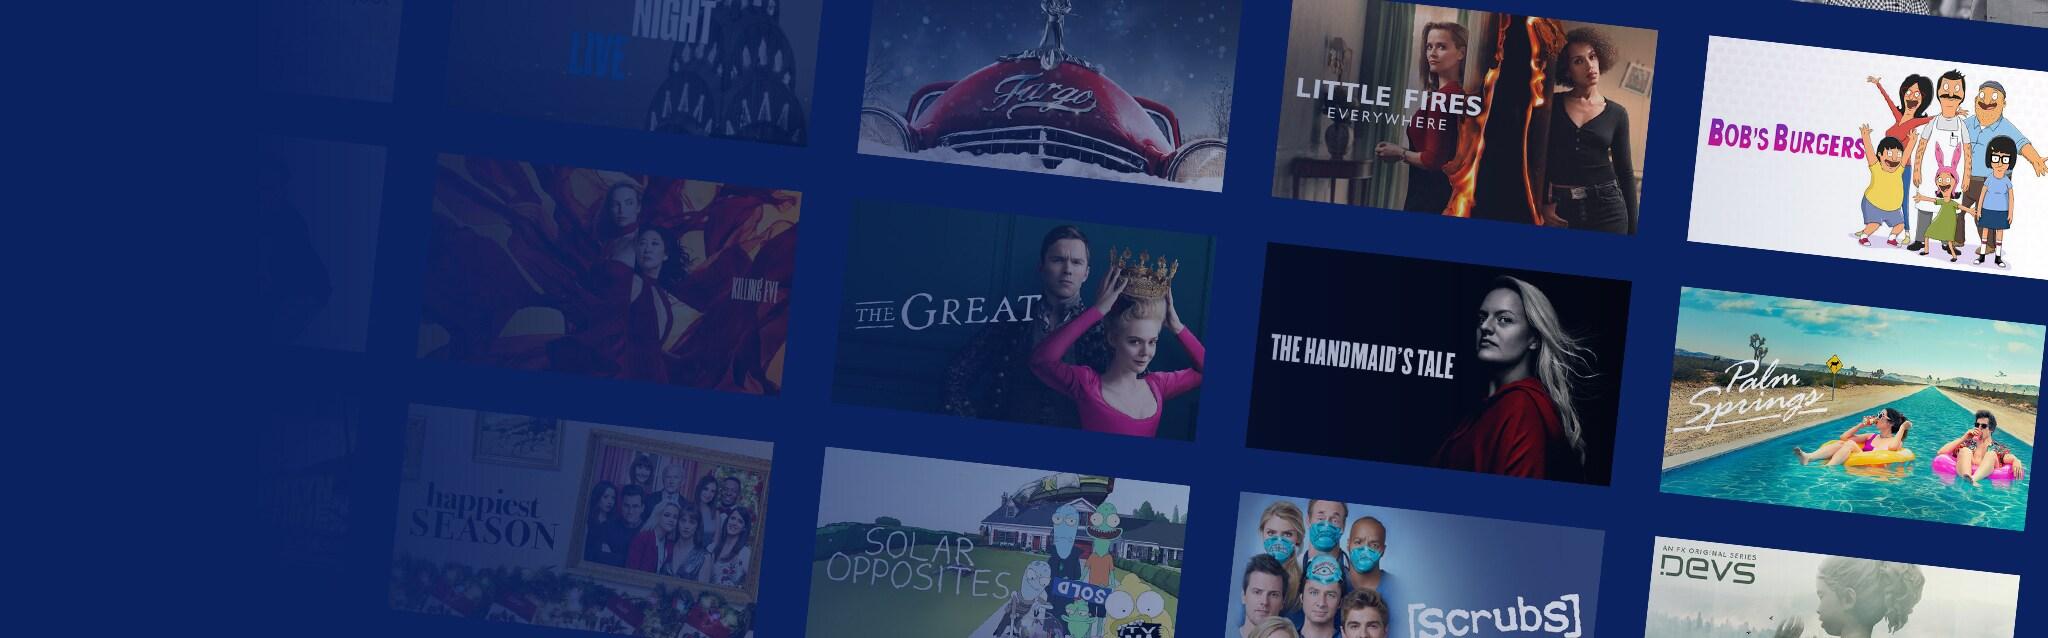 EMEA Hero Banner | About Hulu